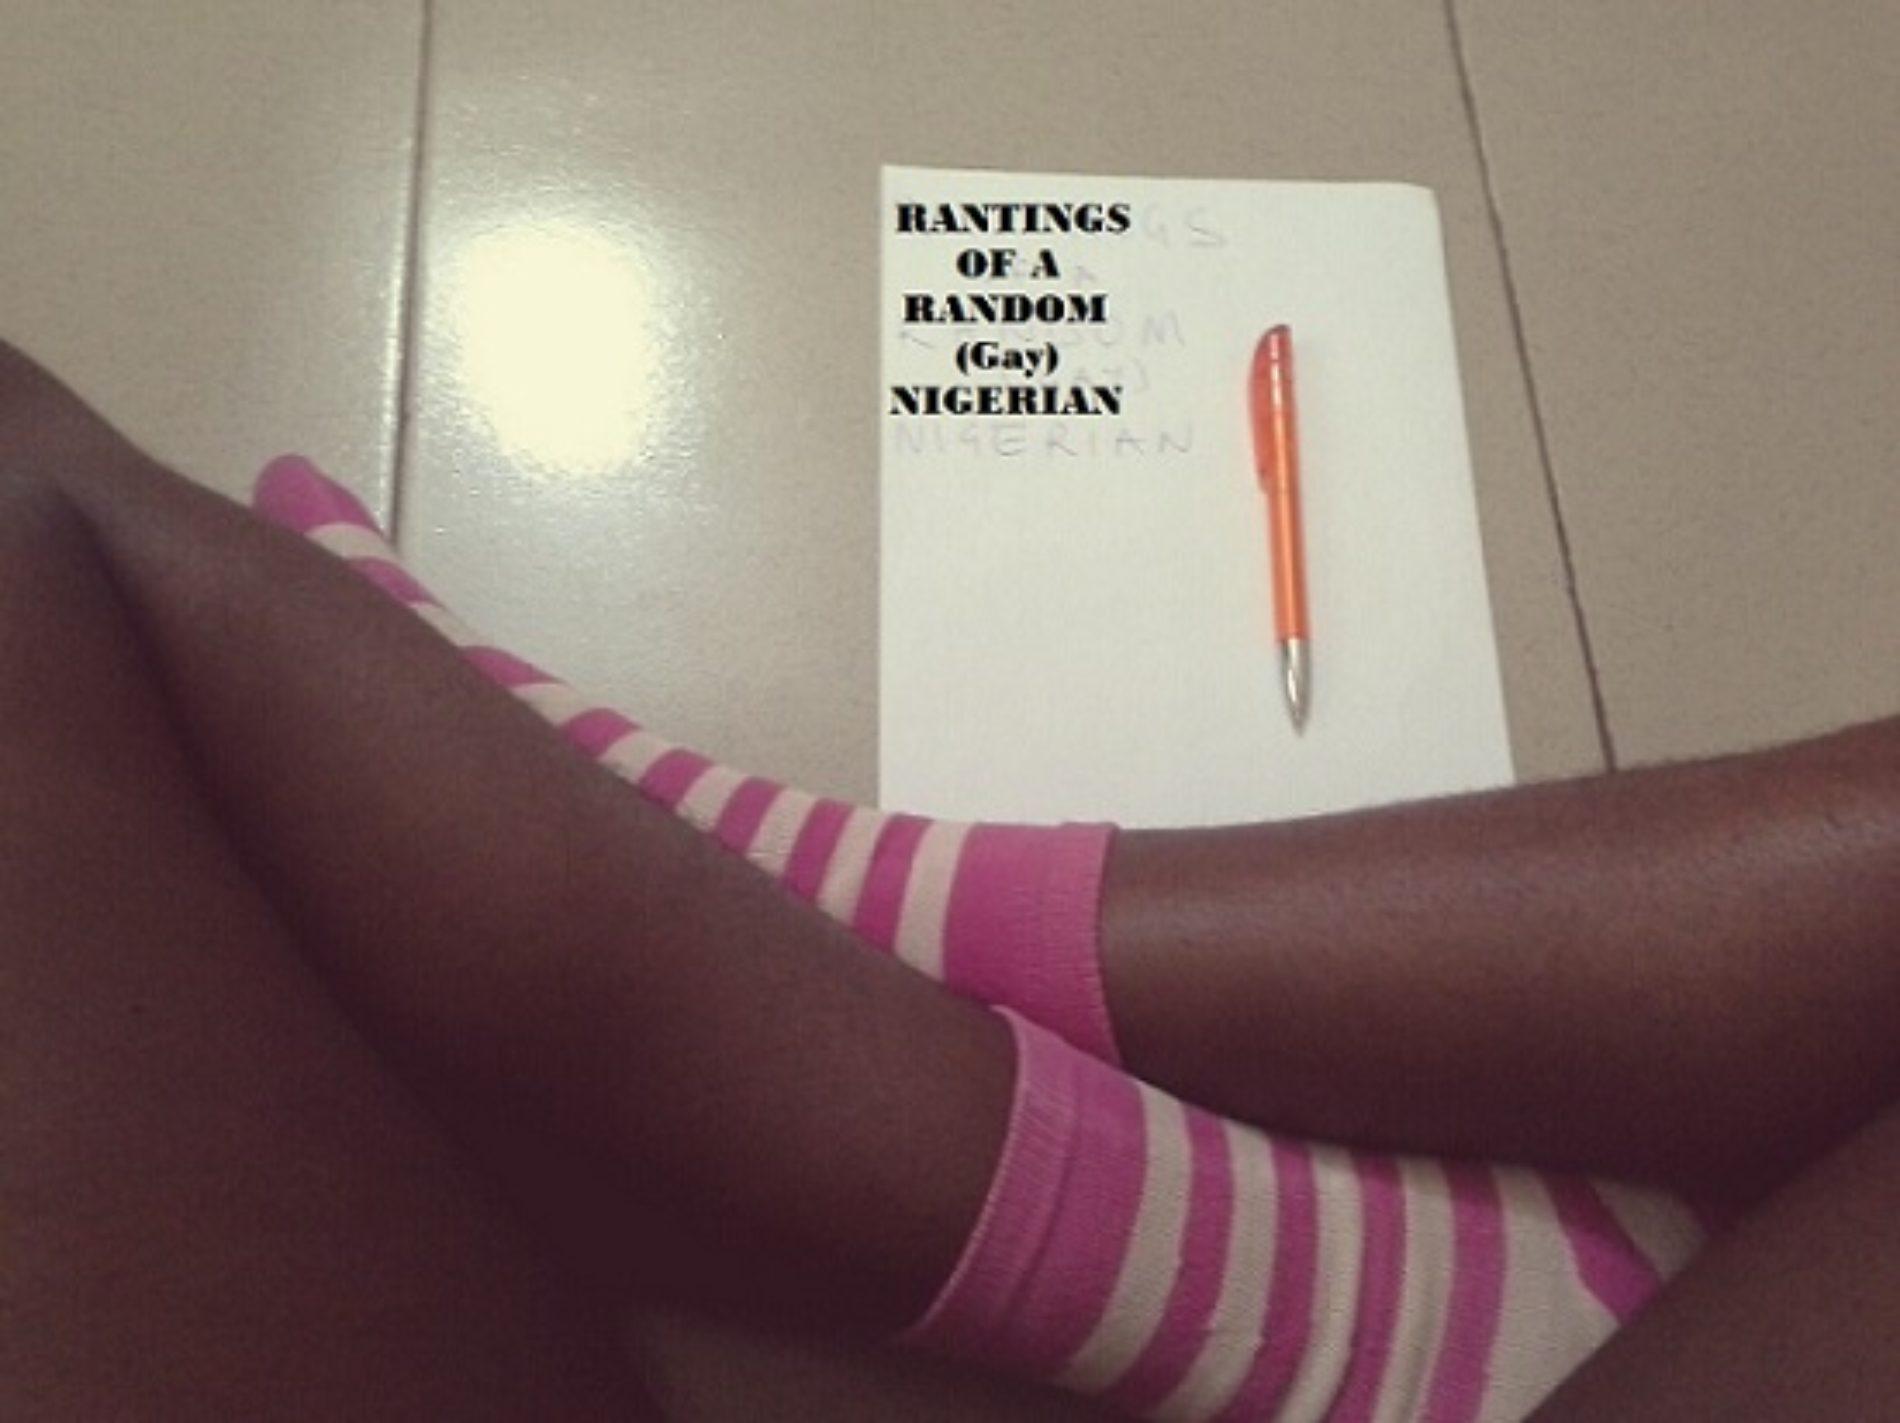 RANTINGS OF A RANDOM (Gay) NIGERIAN (Entry 57)